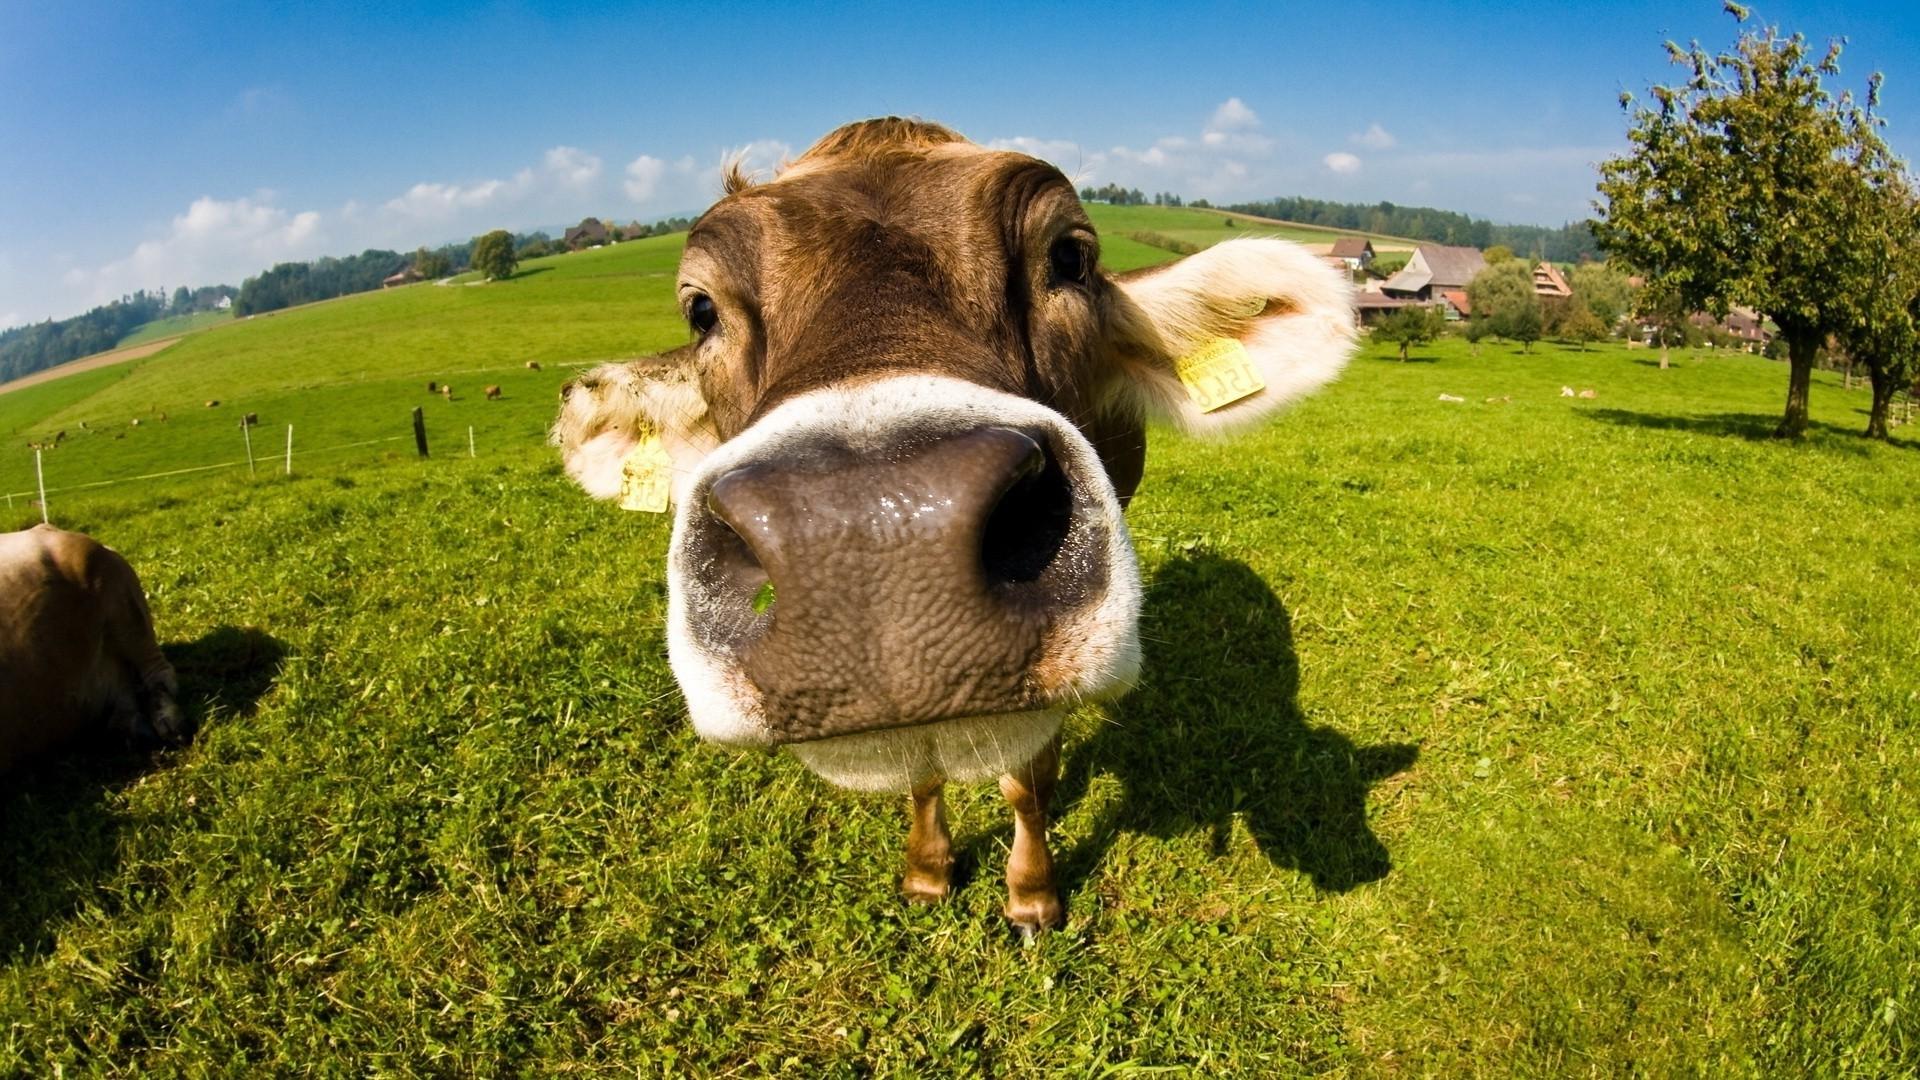 Cow hd desktop wallpaper